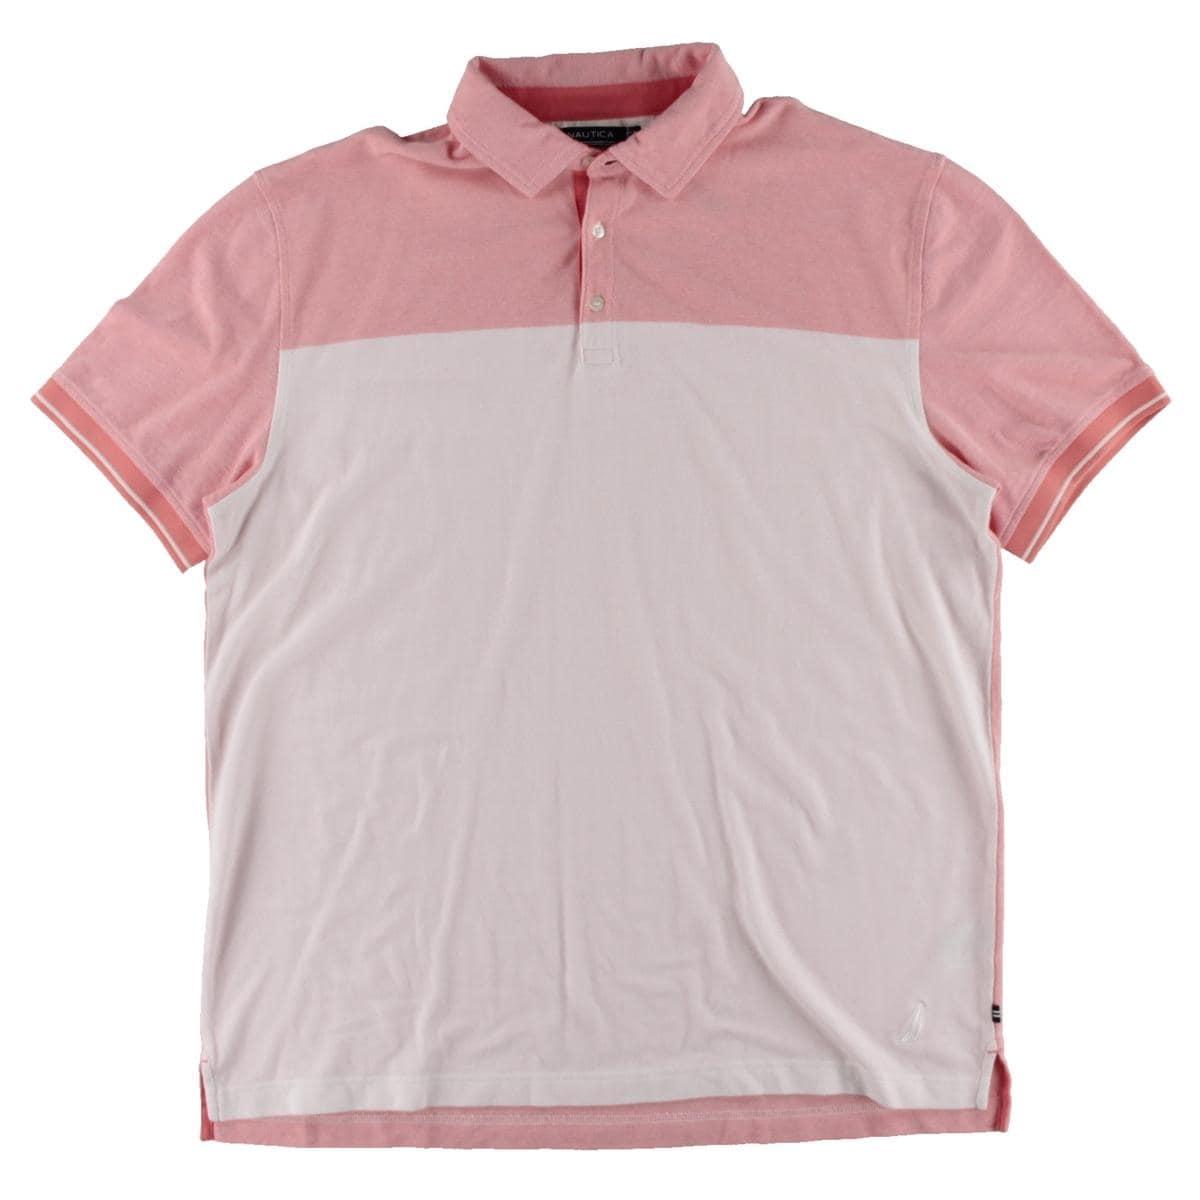 Shop Nautica Mens Polo Shirt Oxford Colorblock Free Shipping Today